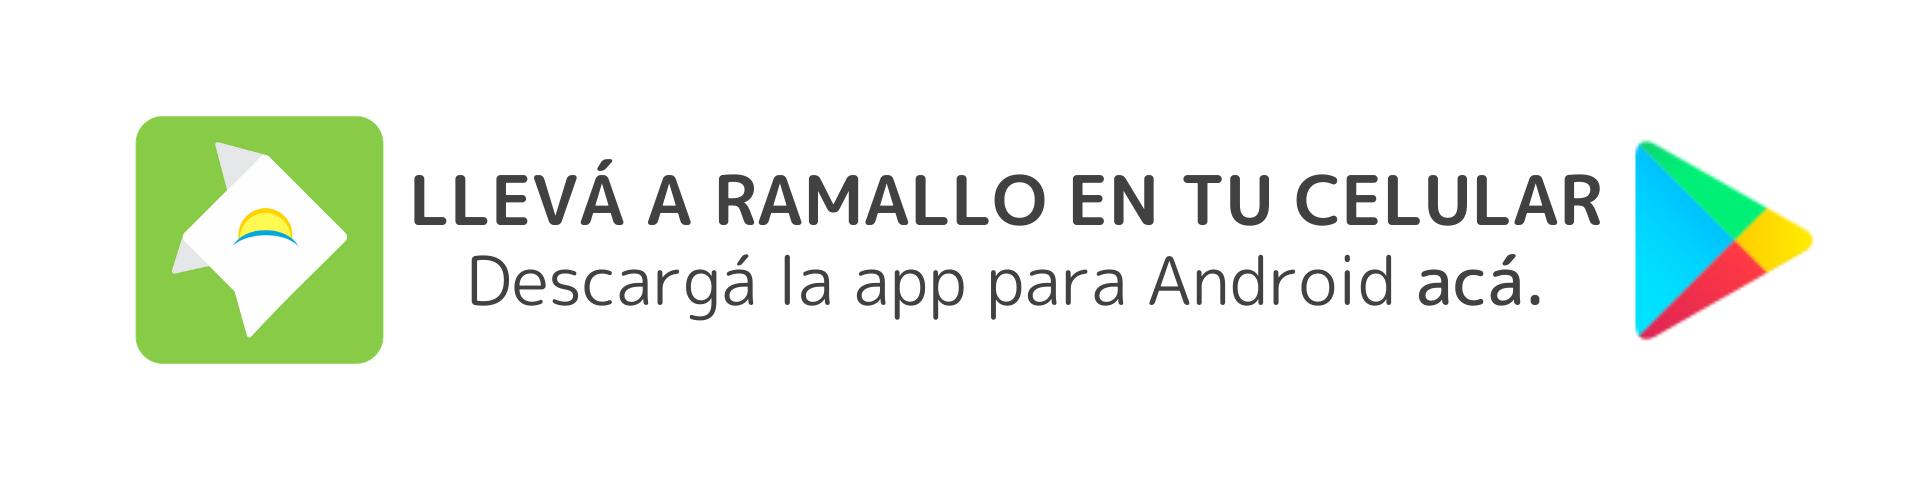 descargá la app de ramallo en tu celular android